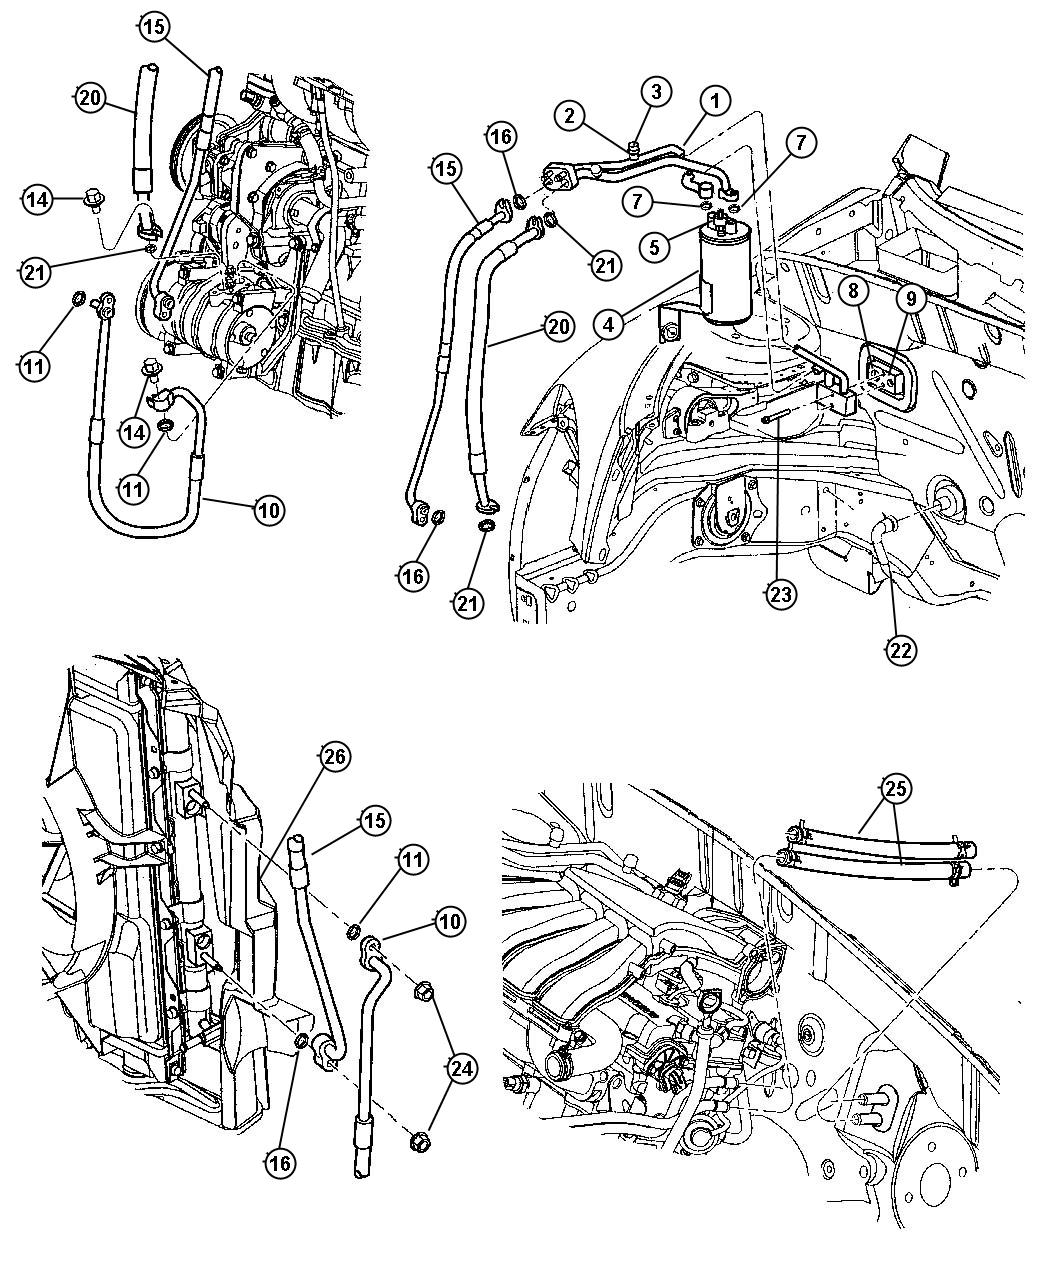 Chrysler Pt Cruiser Condenser Air Conditioning Mopar Note Marelli